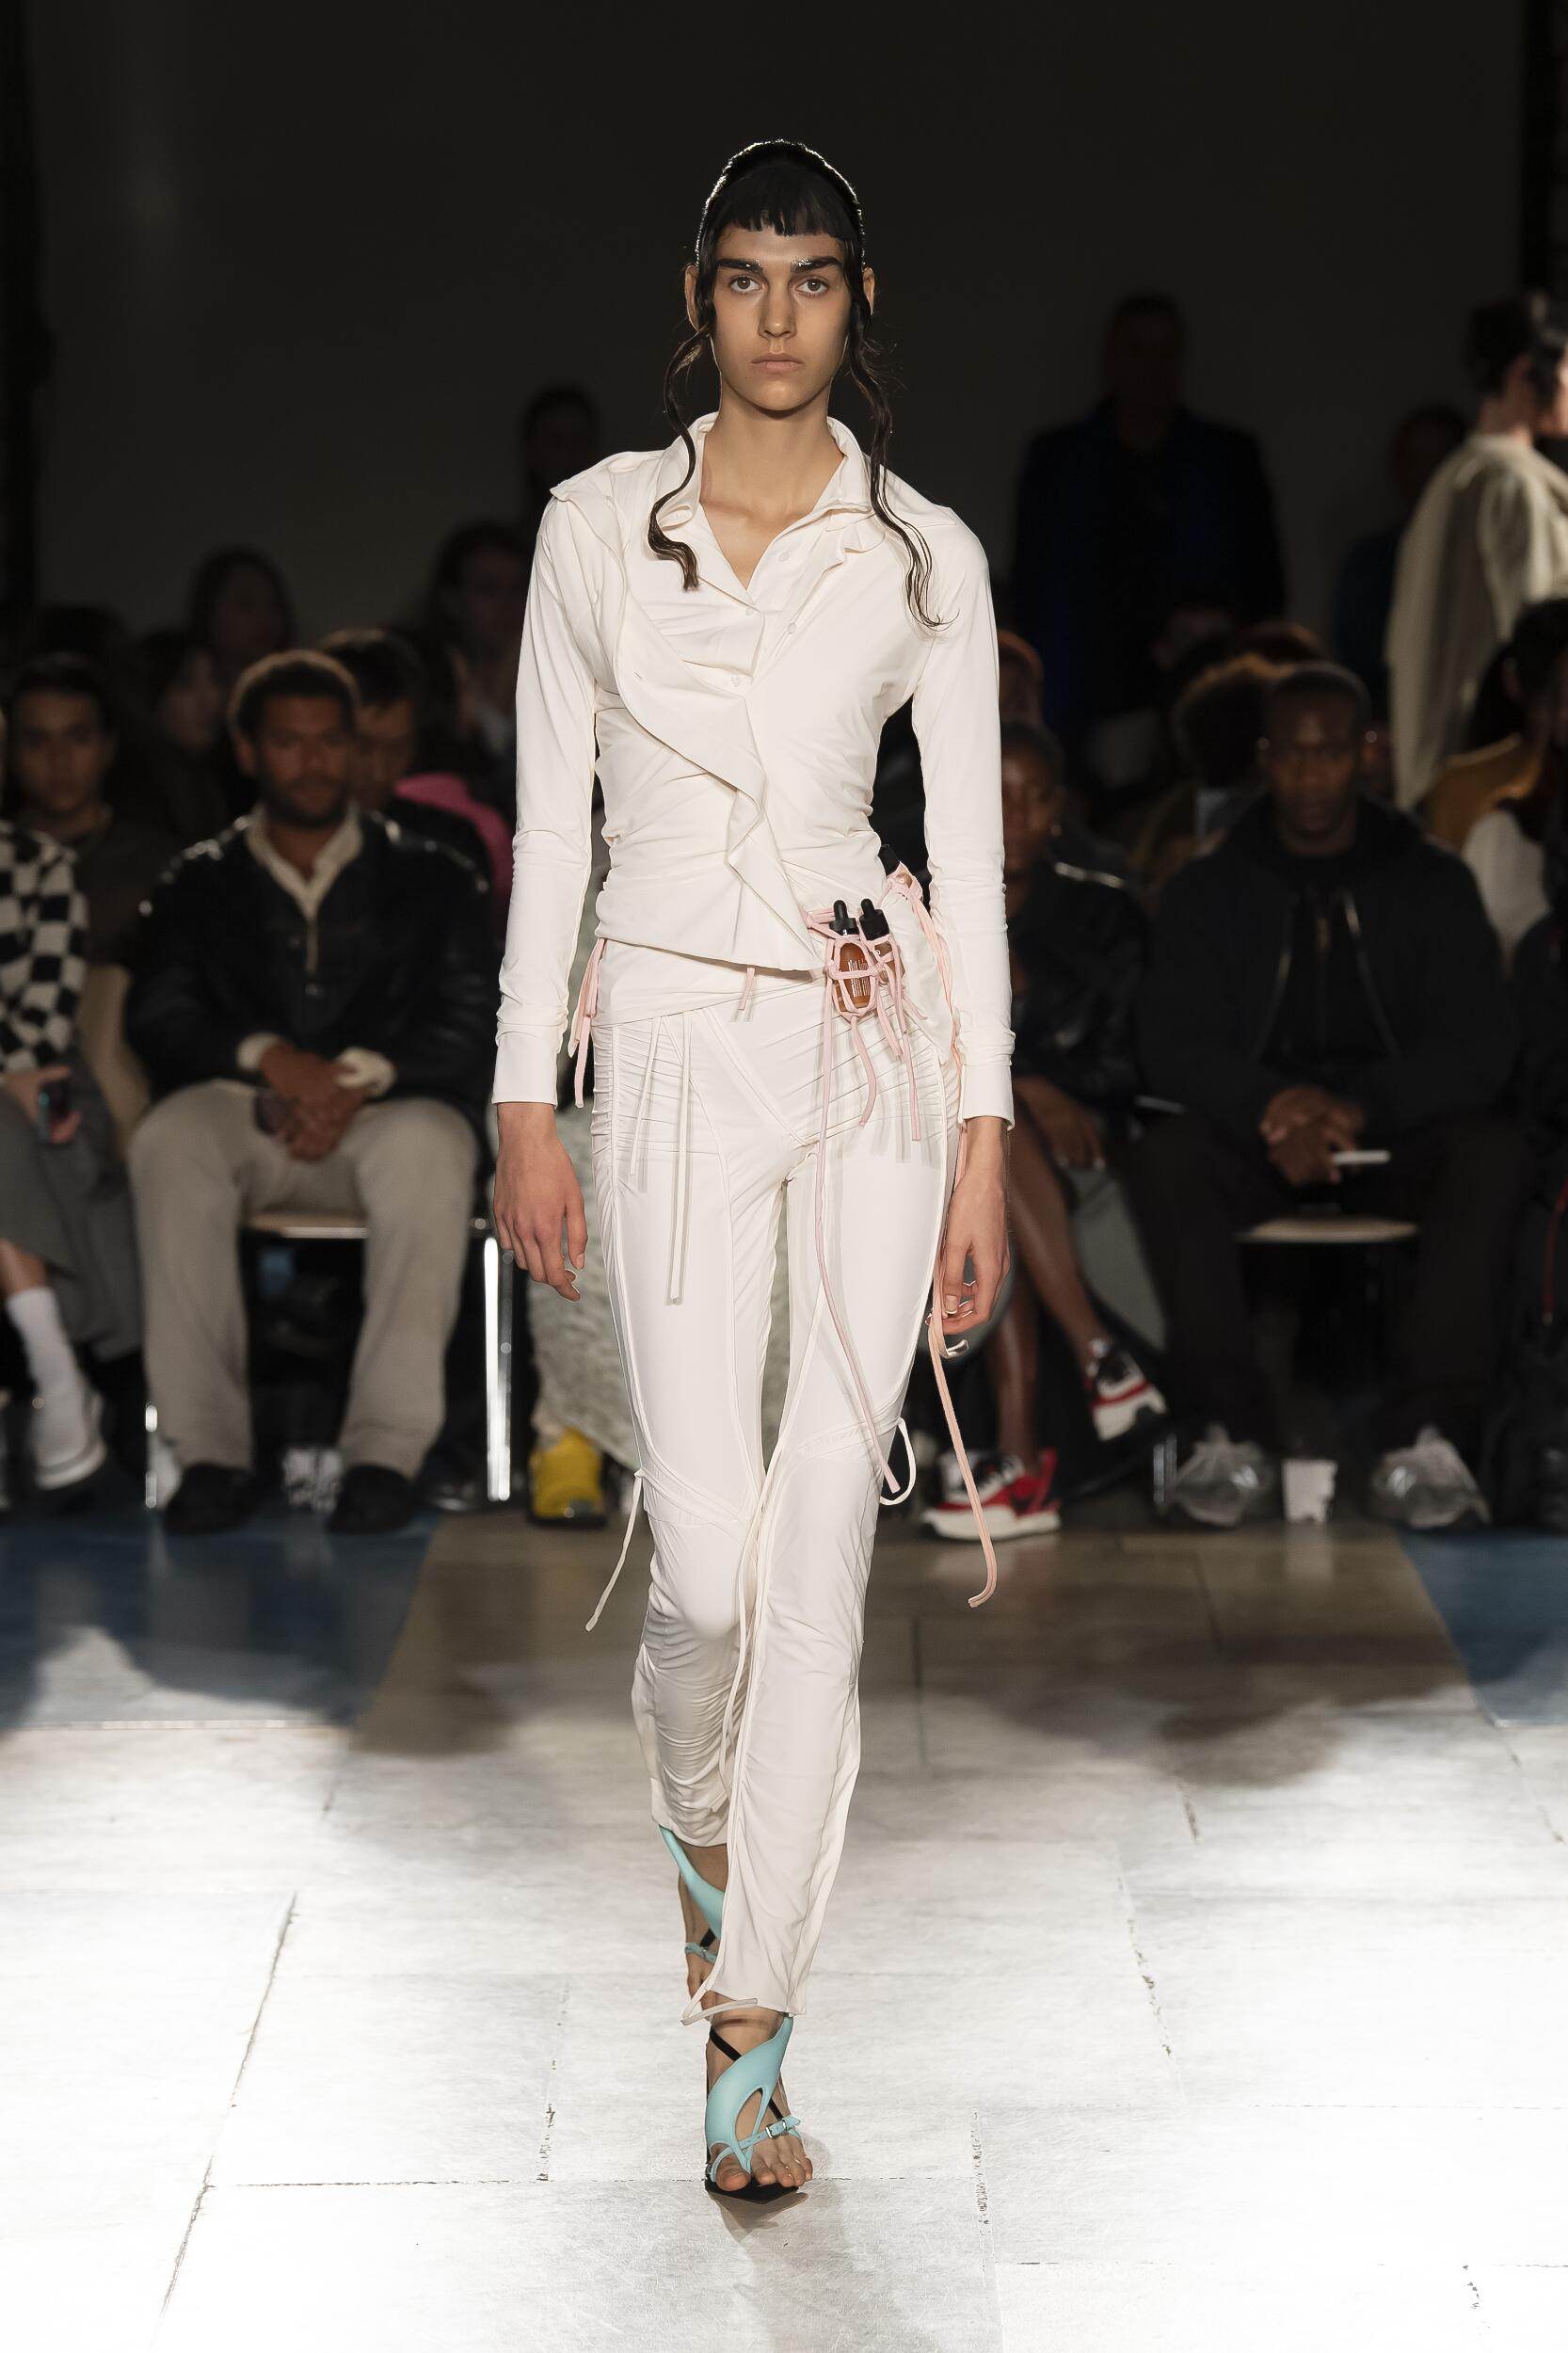 SS 2020 Ottolinger Fashion Show